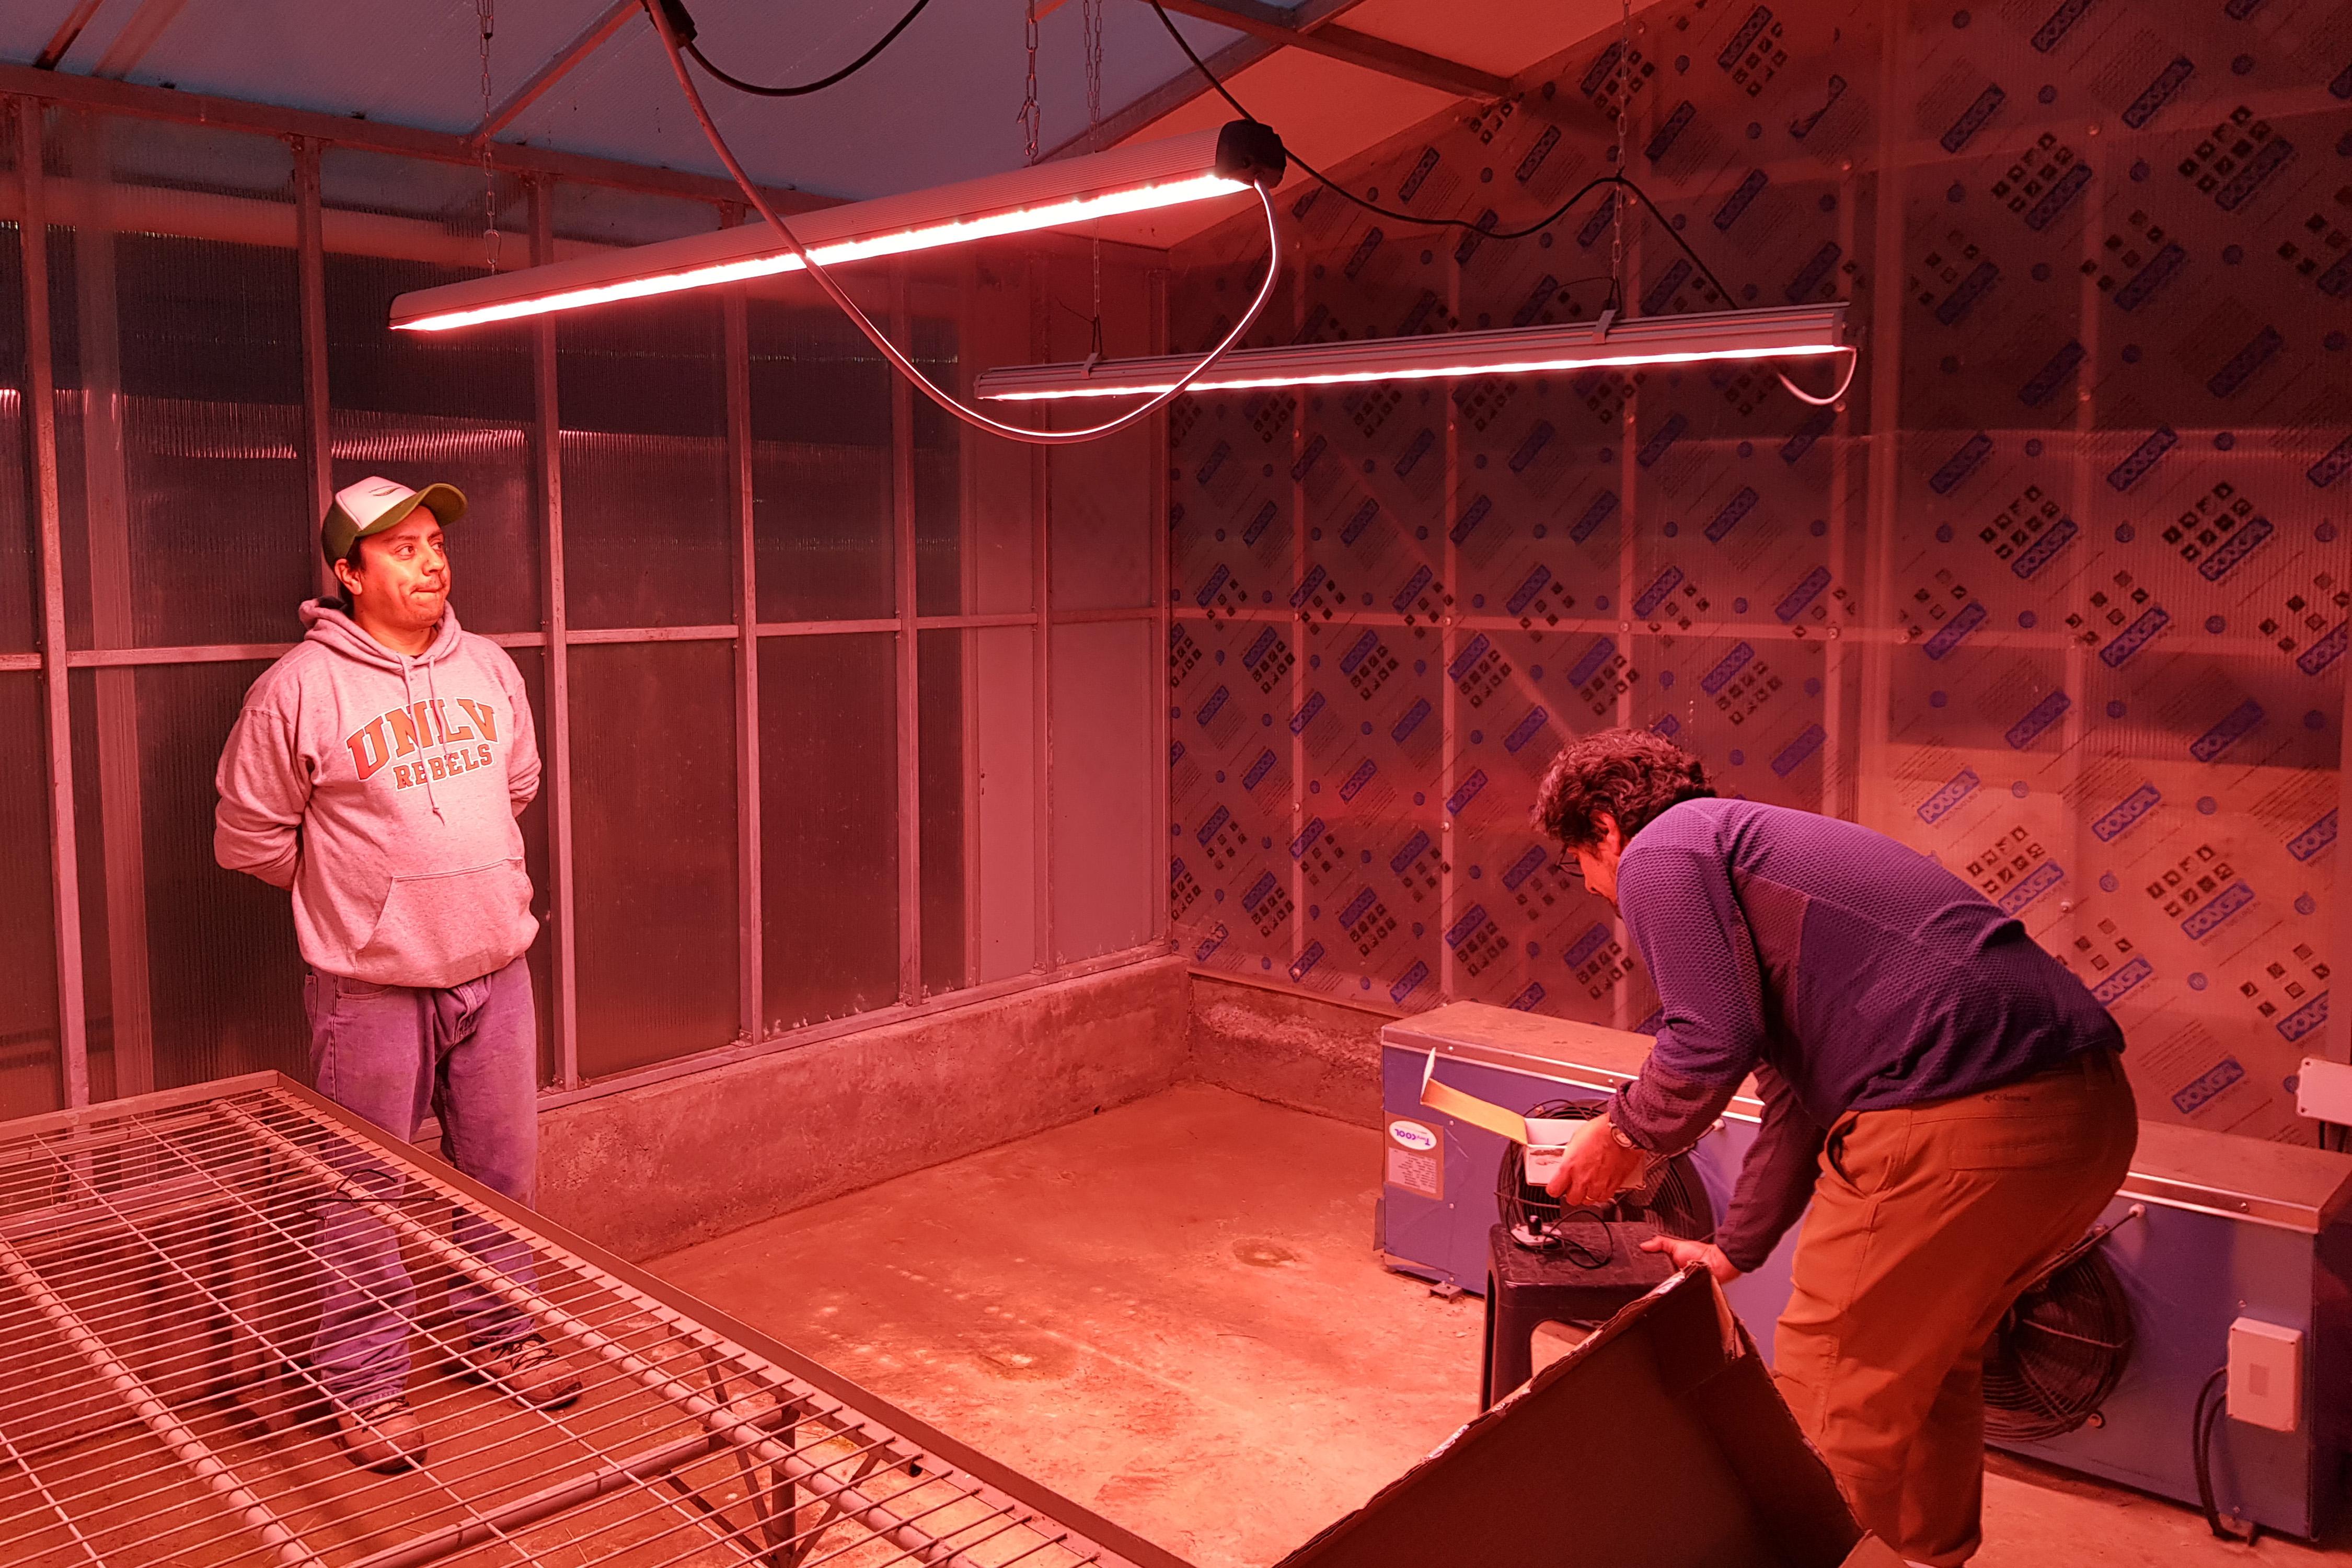 https://www.advanticsys.com/wp-content/uploads/2018/11/greenhouse-inia-installation2.jpg